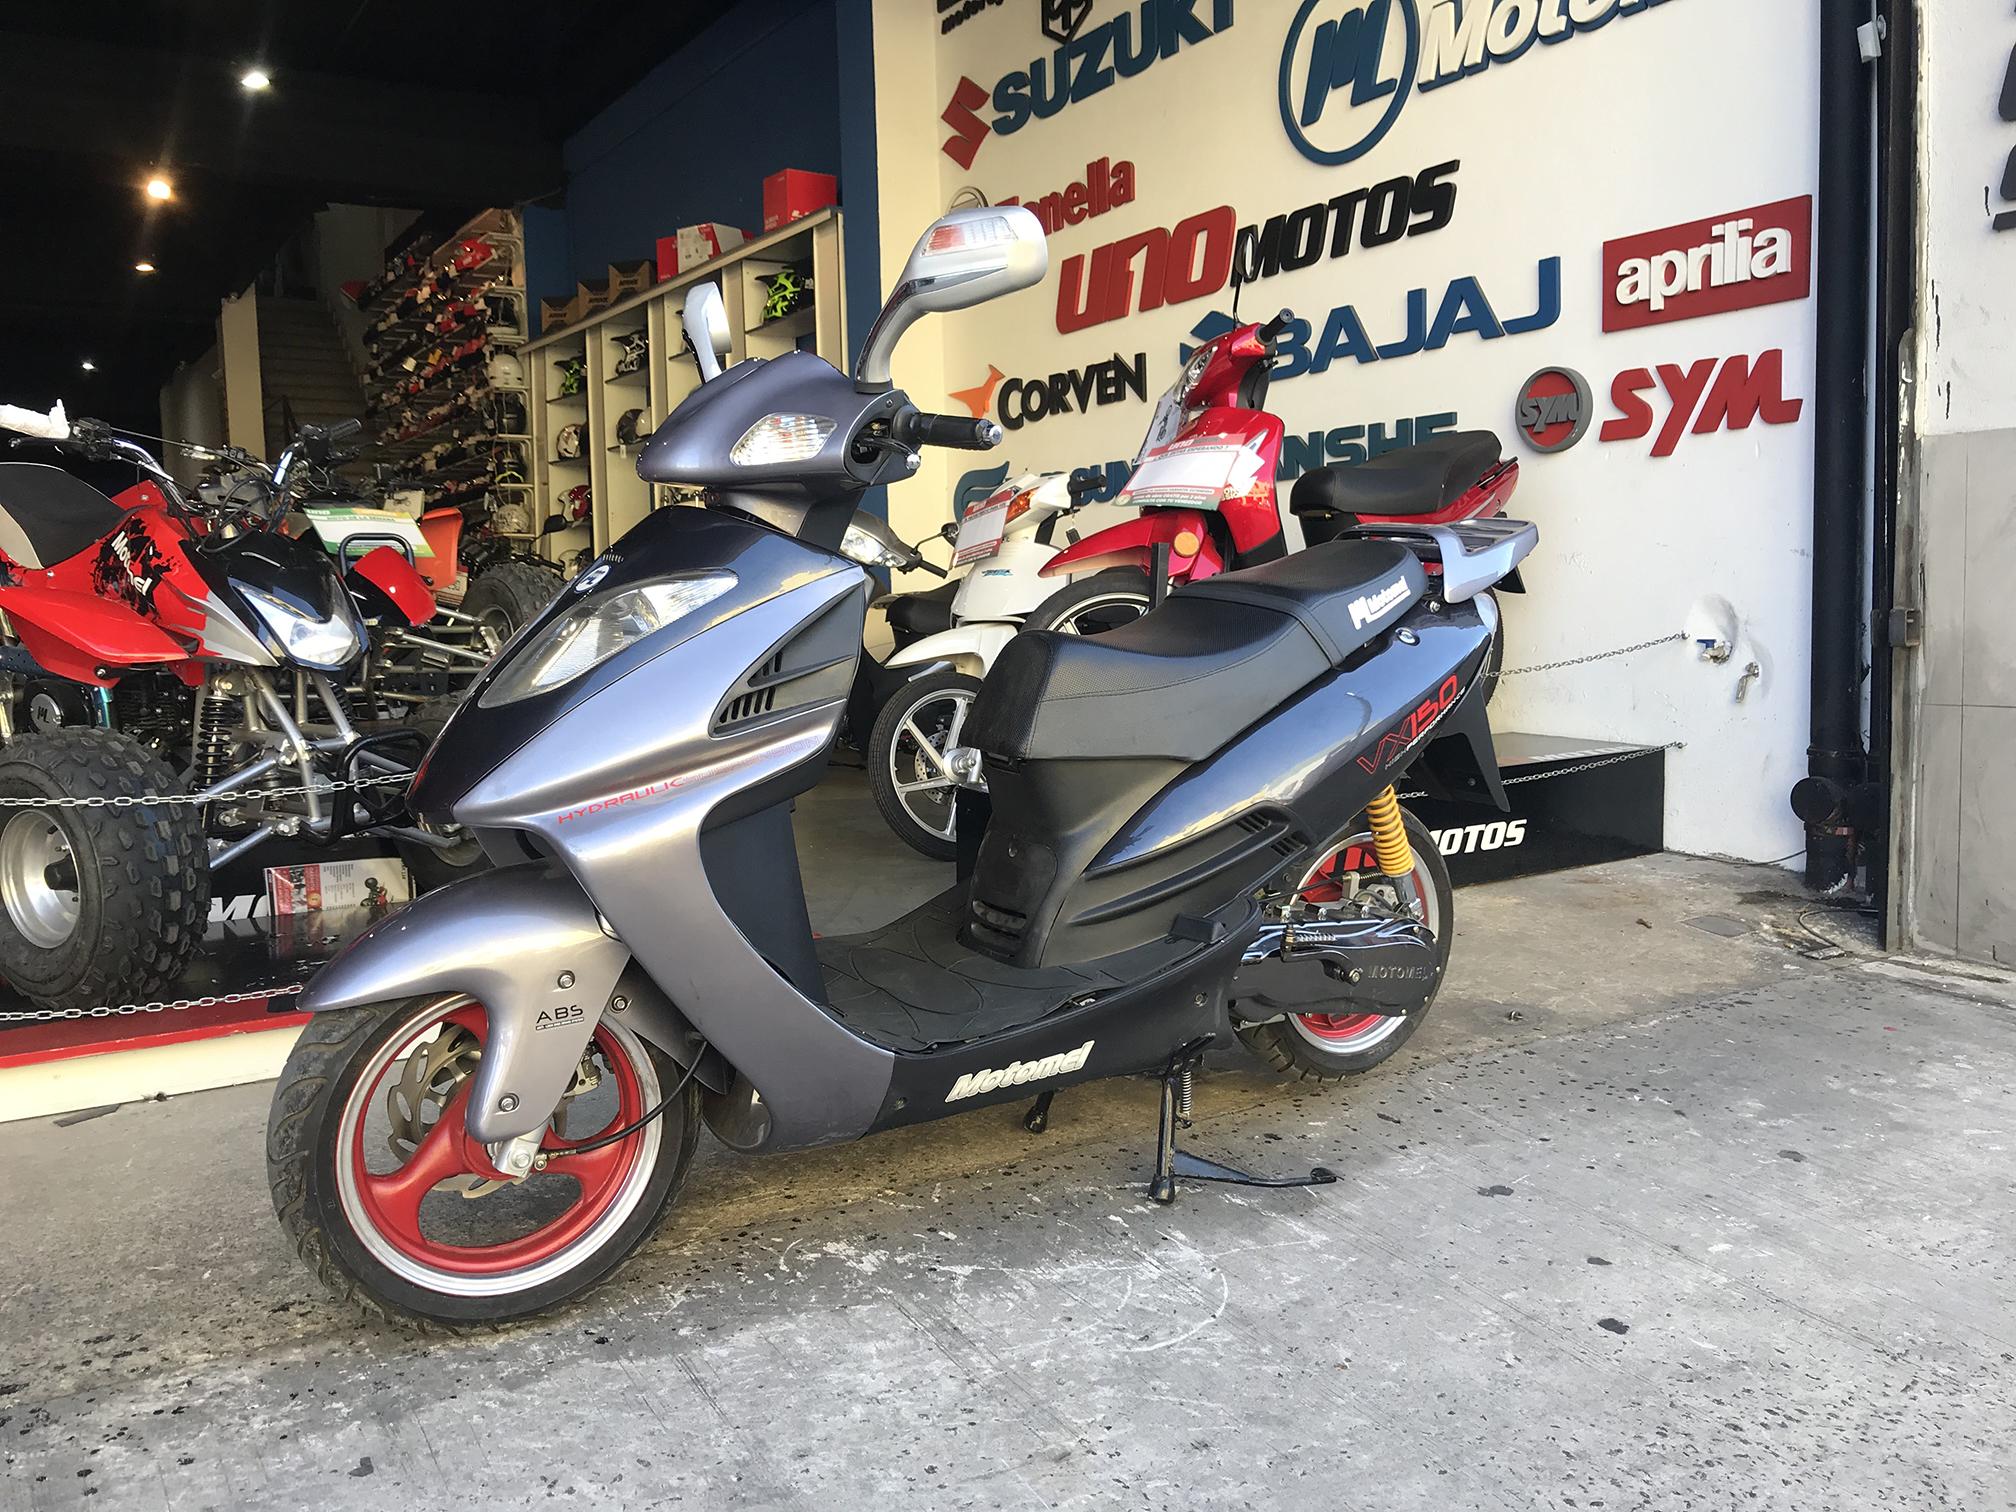 Moto Motomel Vx 150 - Promo Fab 2013